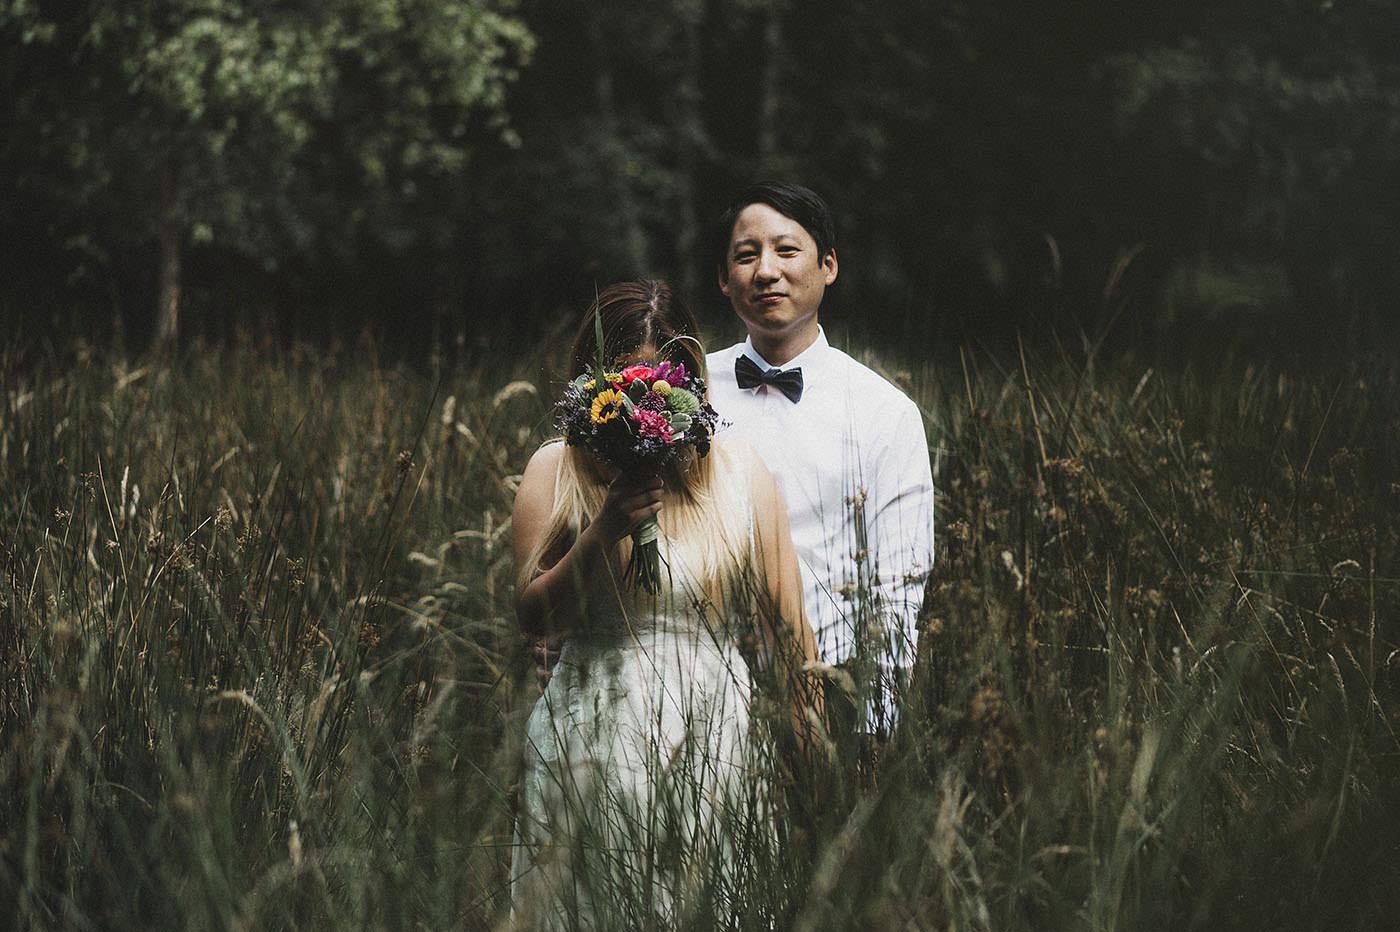 wicklow_wedding_photography016.jpg